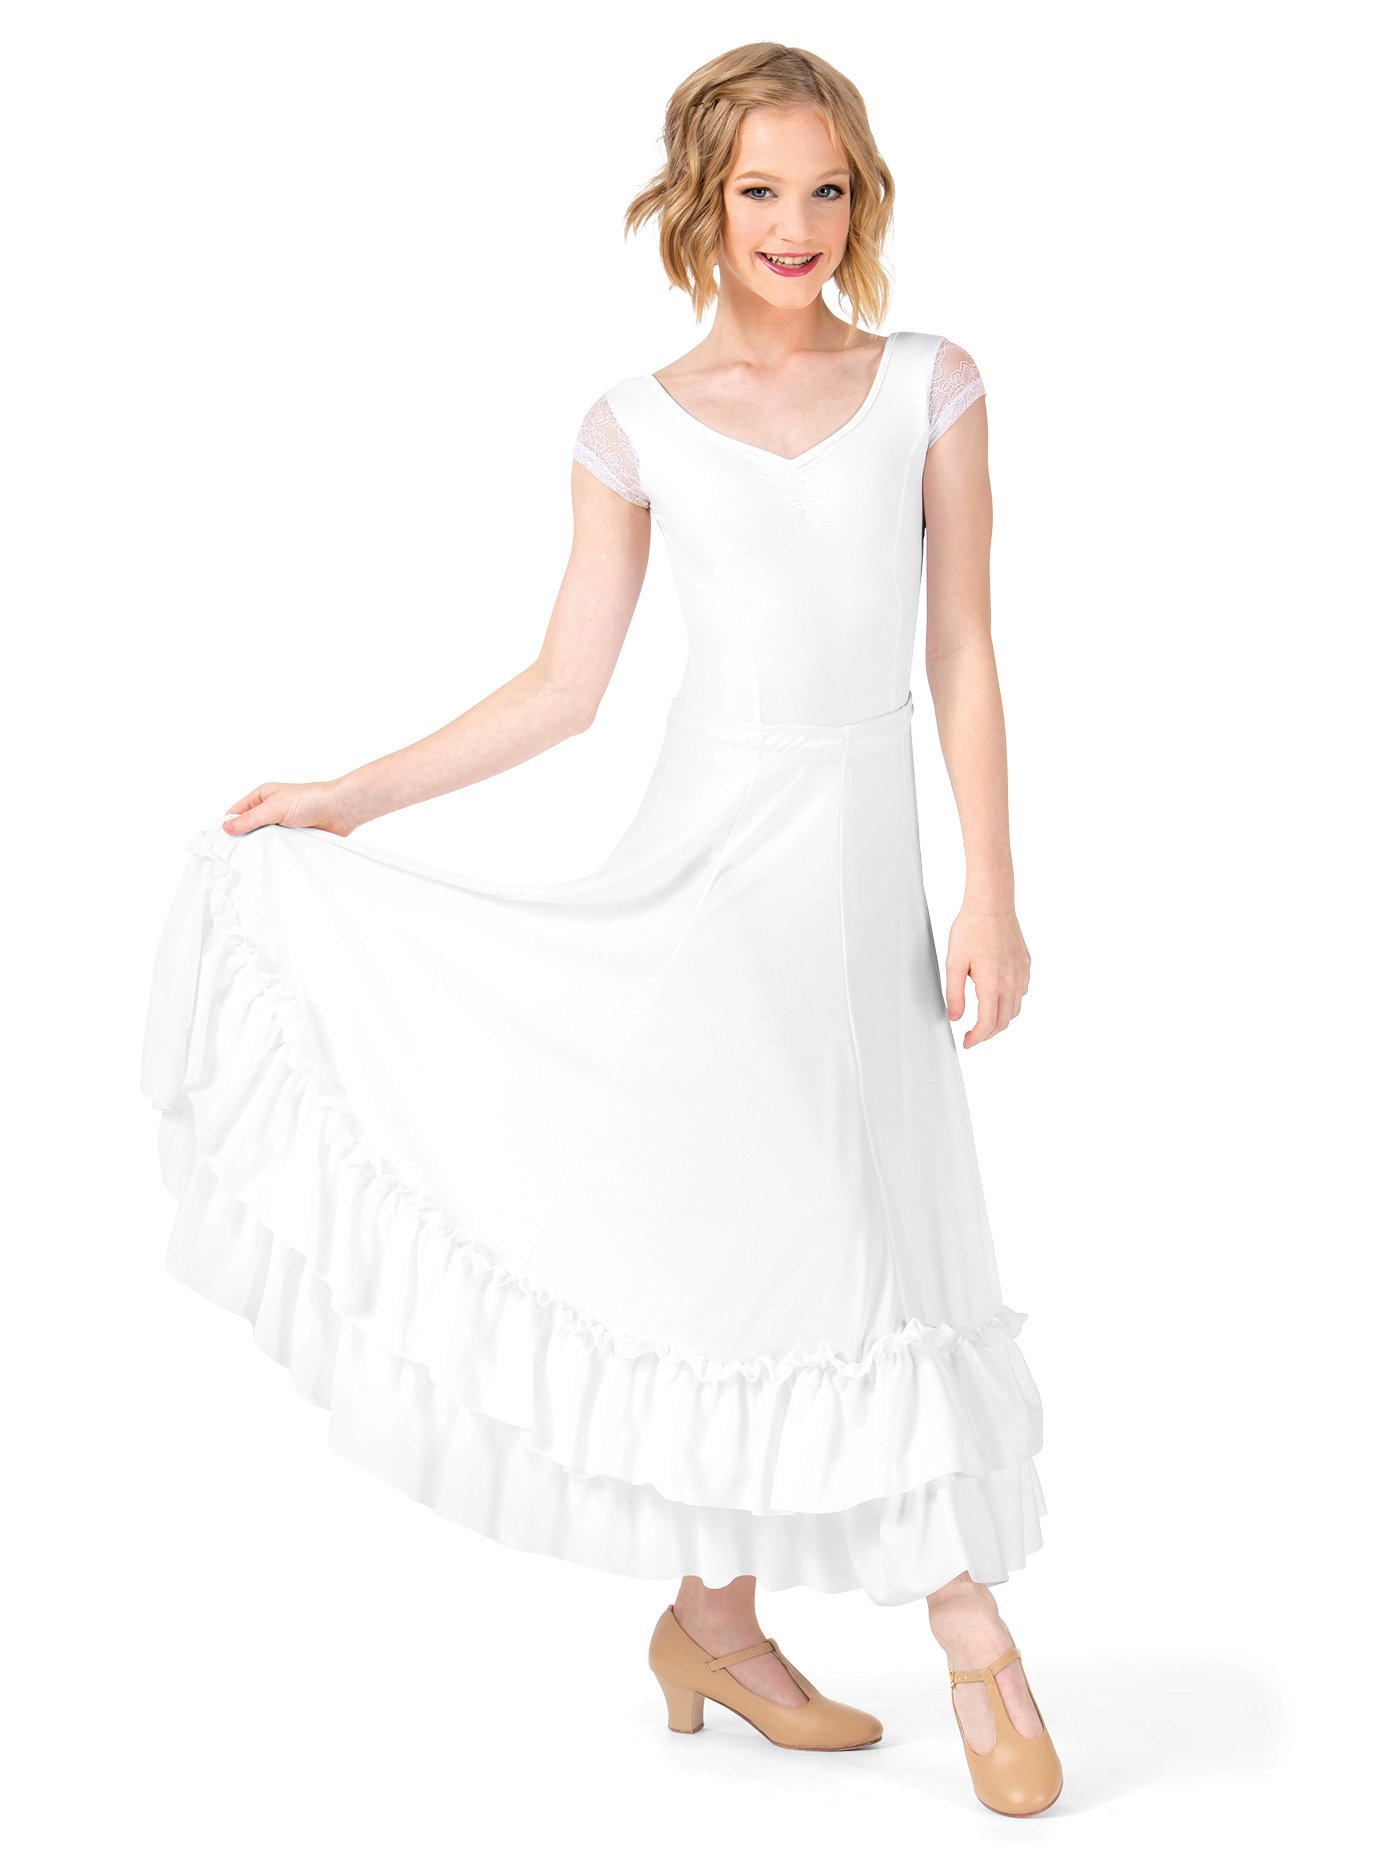 Bal Togs Girls Flamenco Skirt,9100CBLKI,Black,Intermediate by Bal Togs